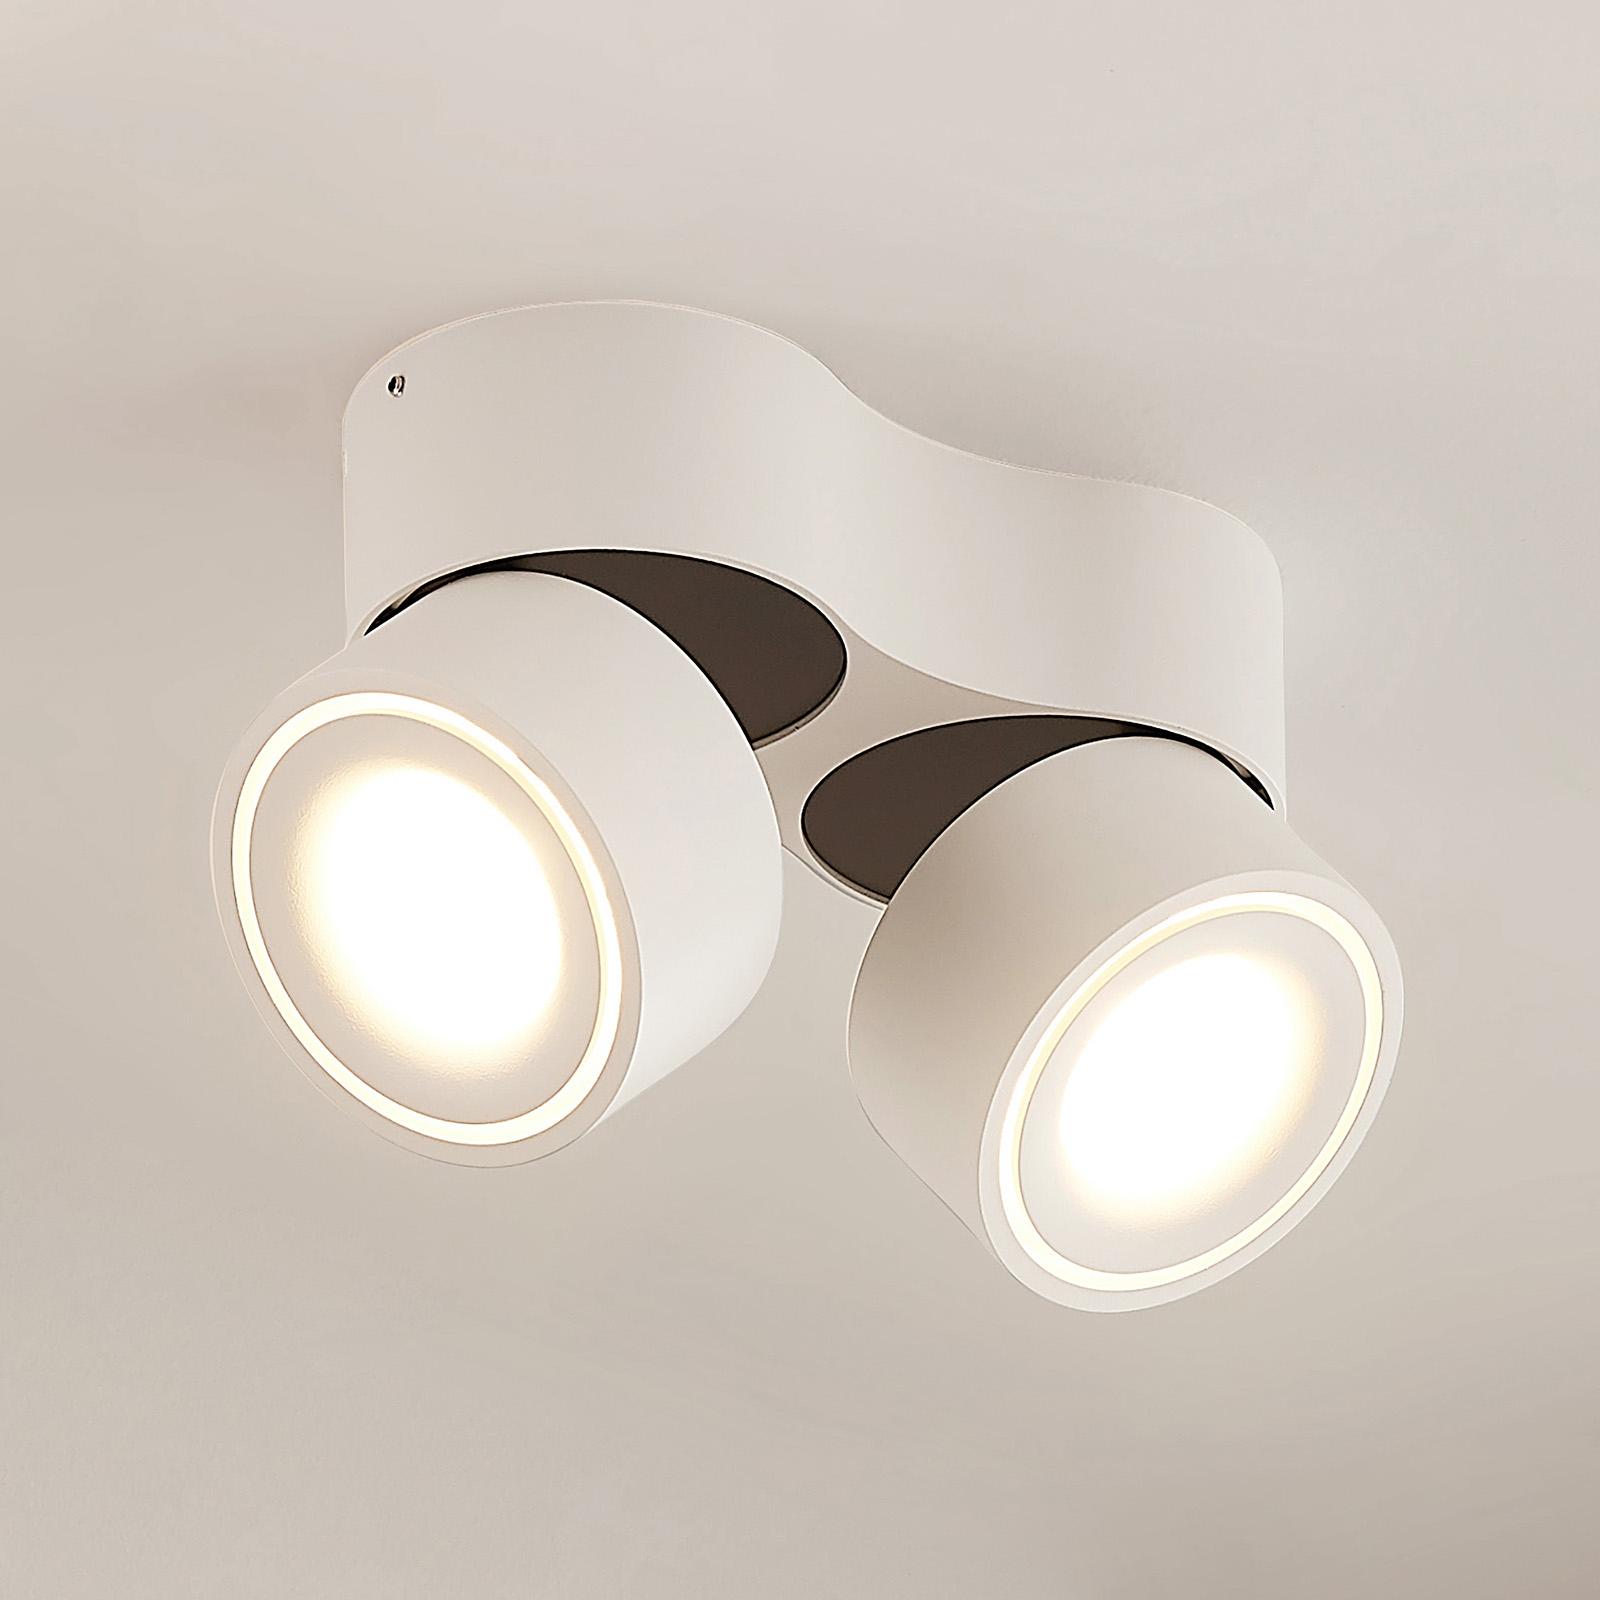 Arcchio Rotari LED-takspot, 2 lyskilder, 2x8,9W